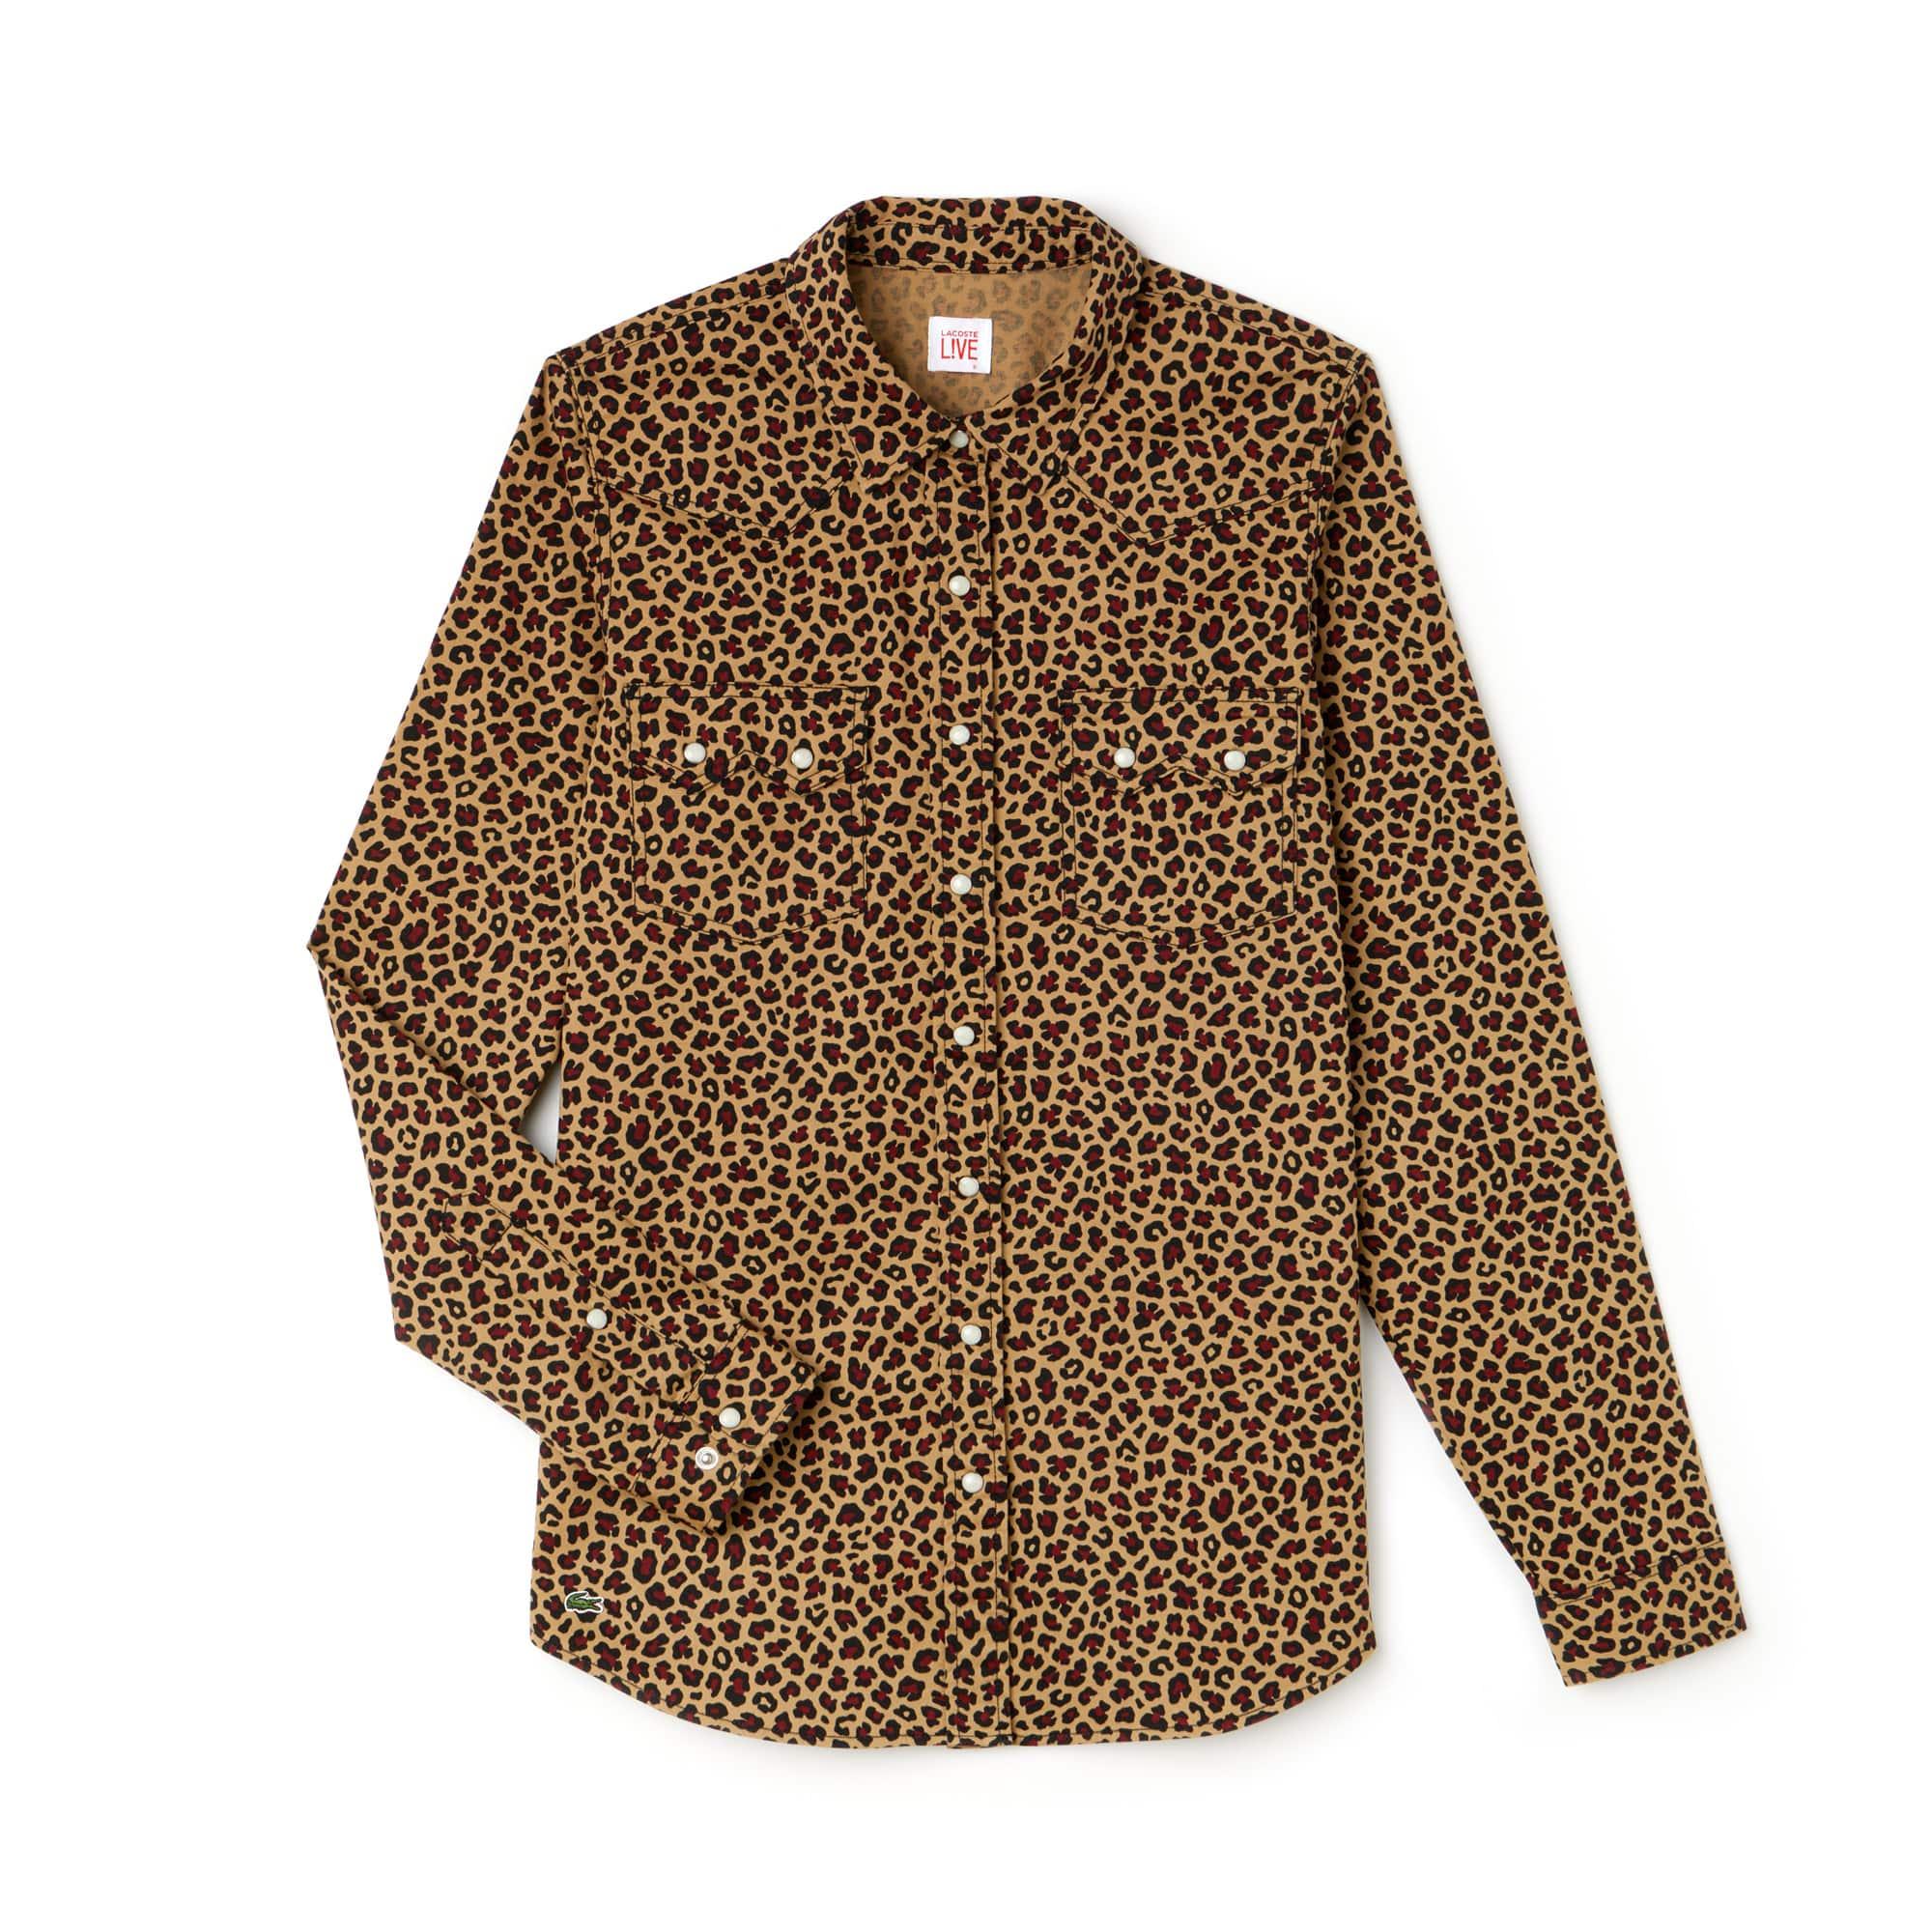 Damen LACOSTE L!VE Bluse aus Stretch-Twill mit Leopard-Print